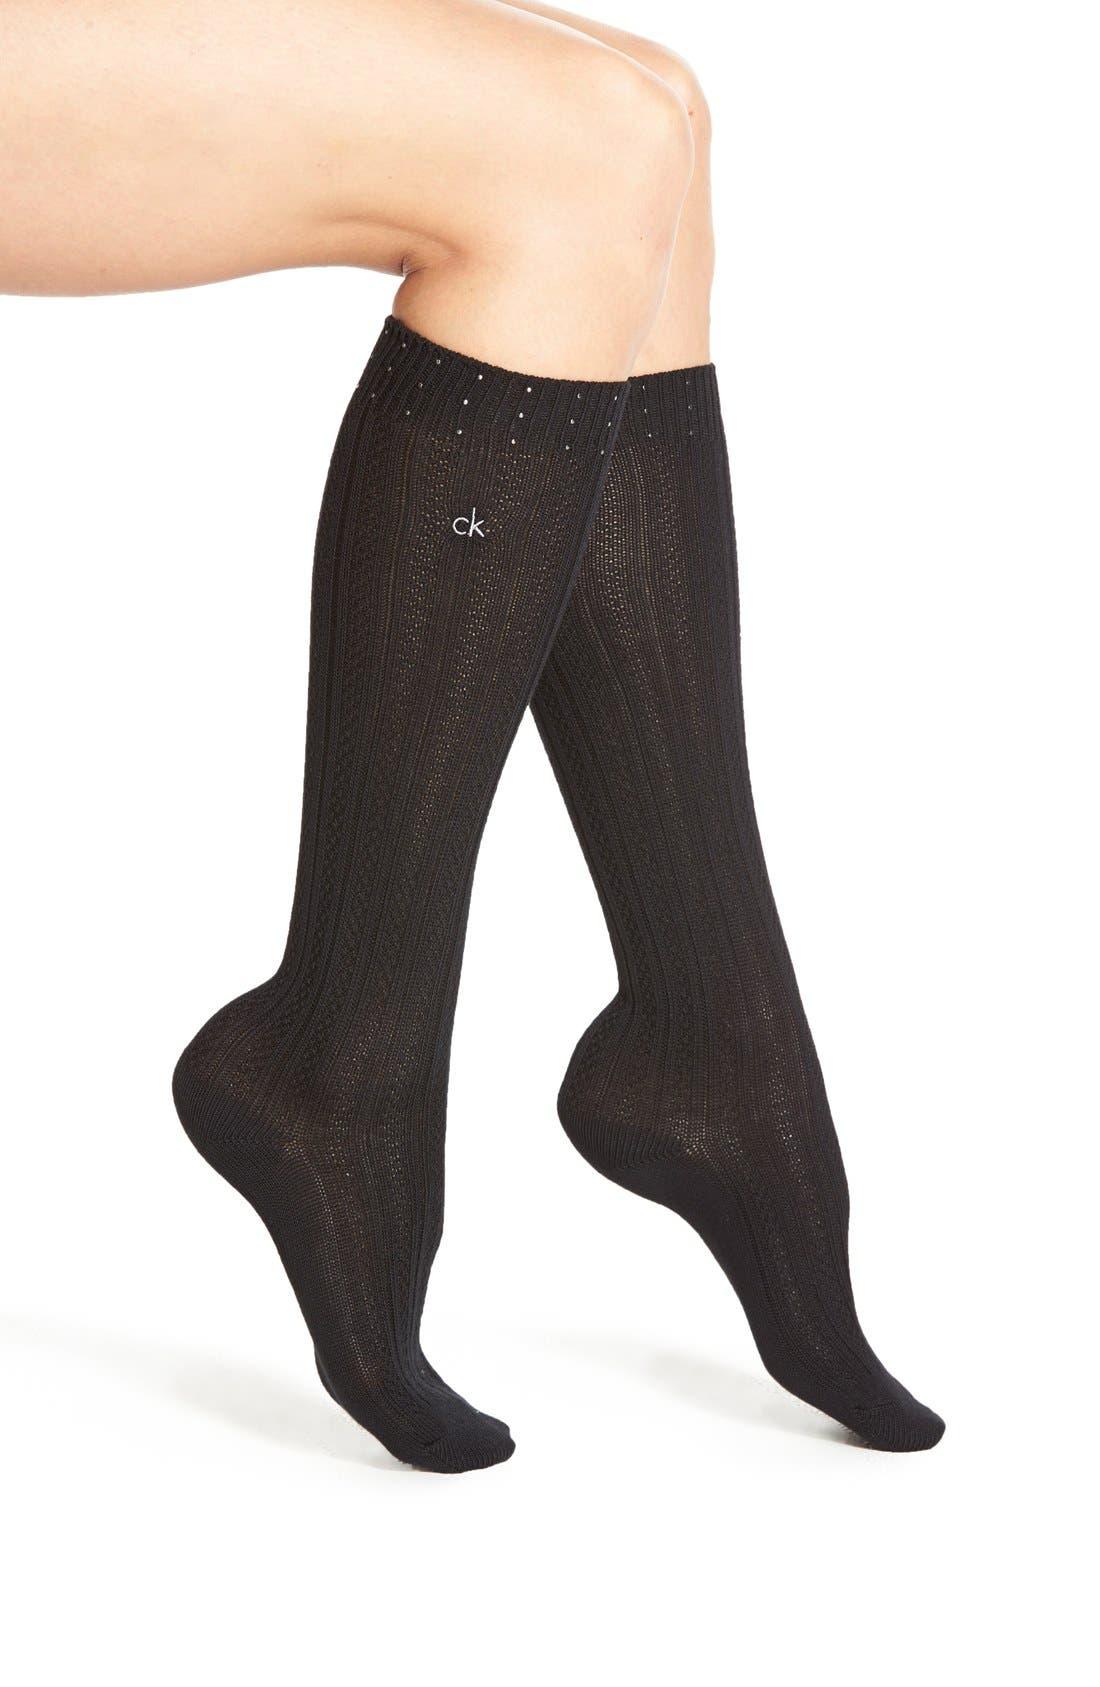 Alternate Image 1 Selected - Calvin Klein 'Holiday Sparkle' Knee High Socks